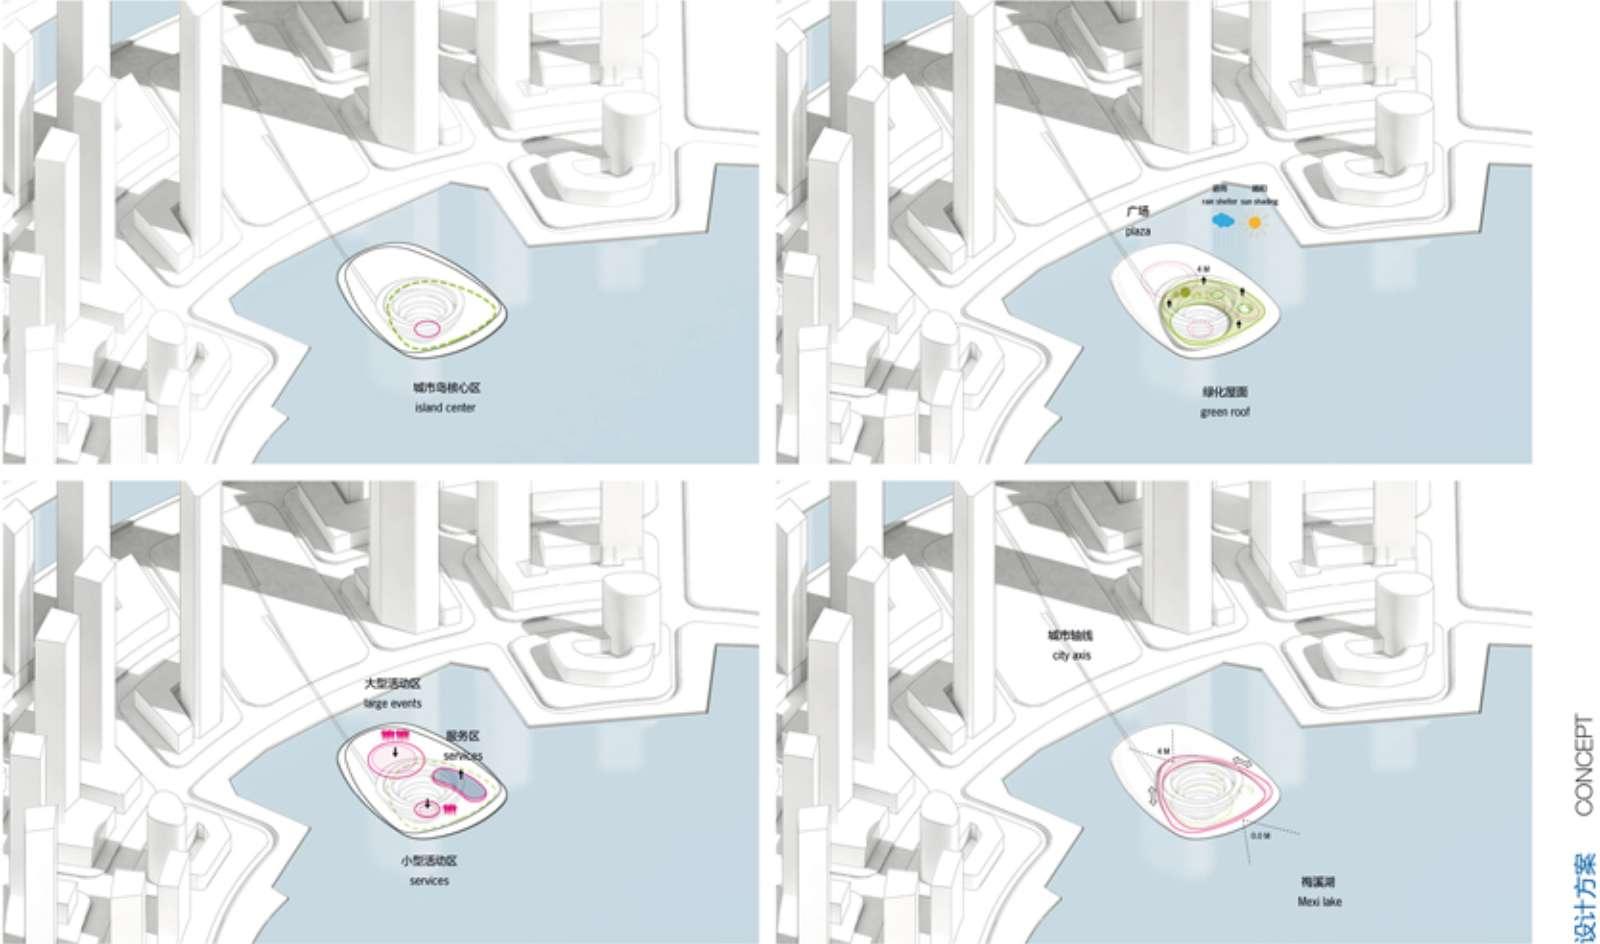 07-KSP-wins-the-Meixi-Urban-Helix-competition